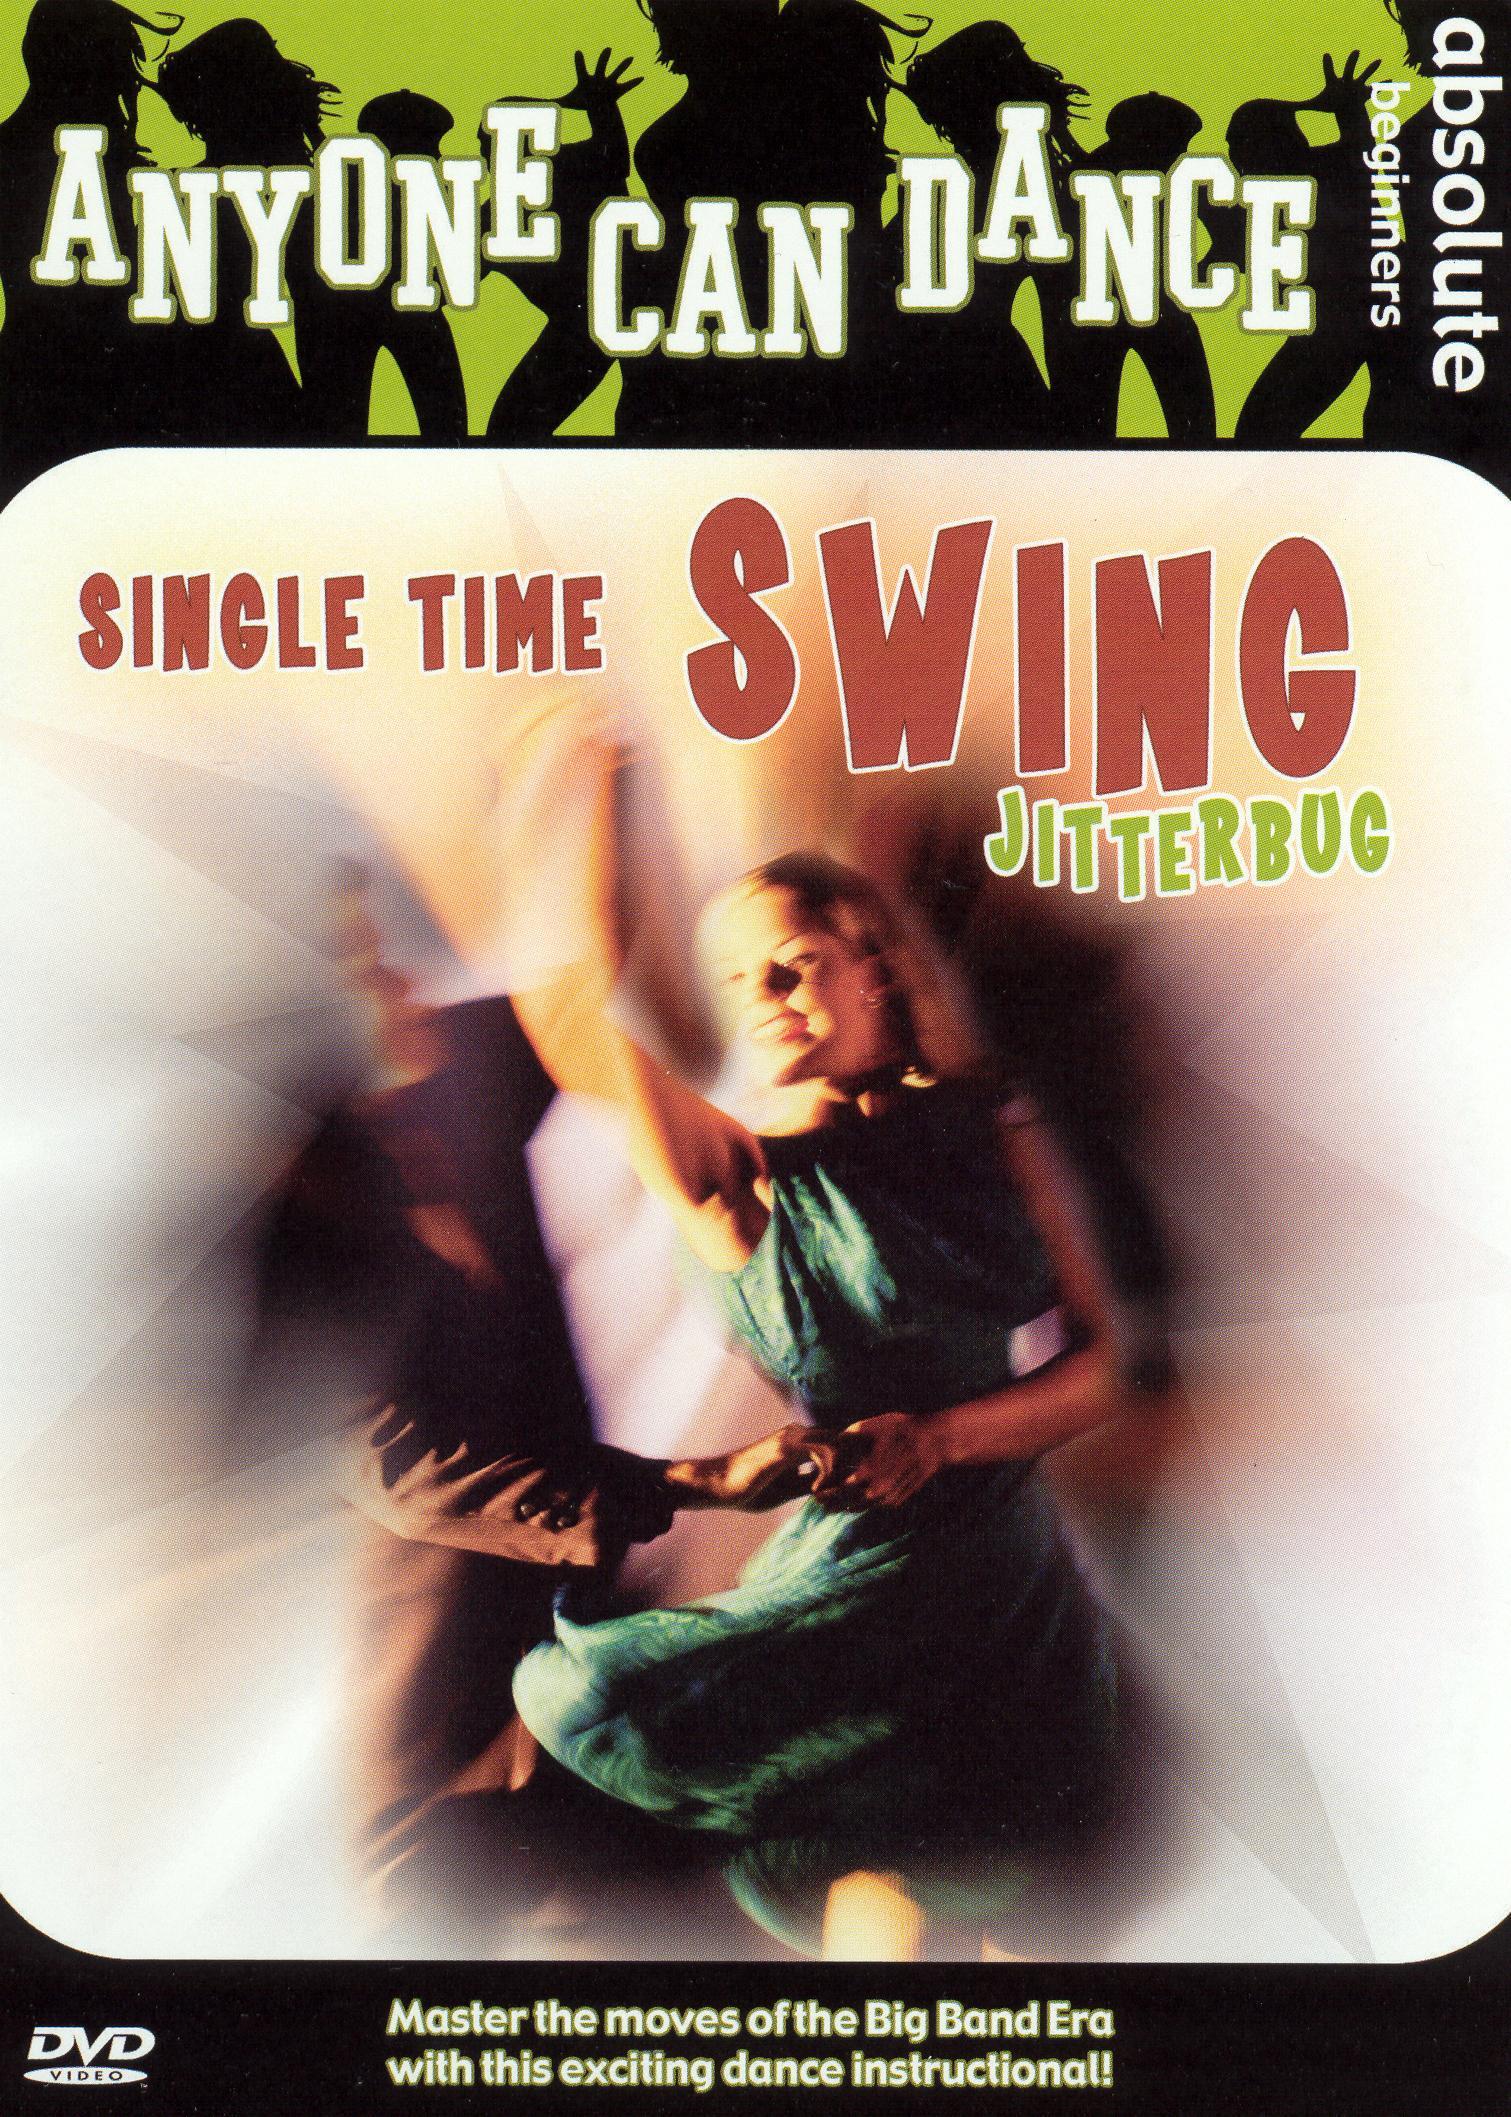 Anyone Can Dance: Single Time Swing Jitterbug